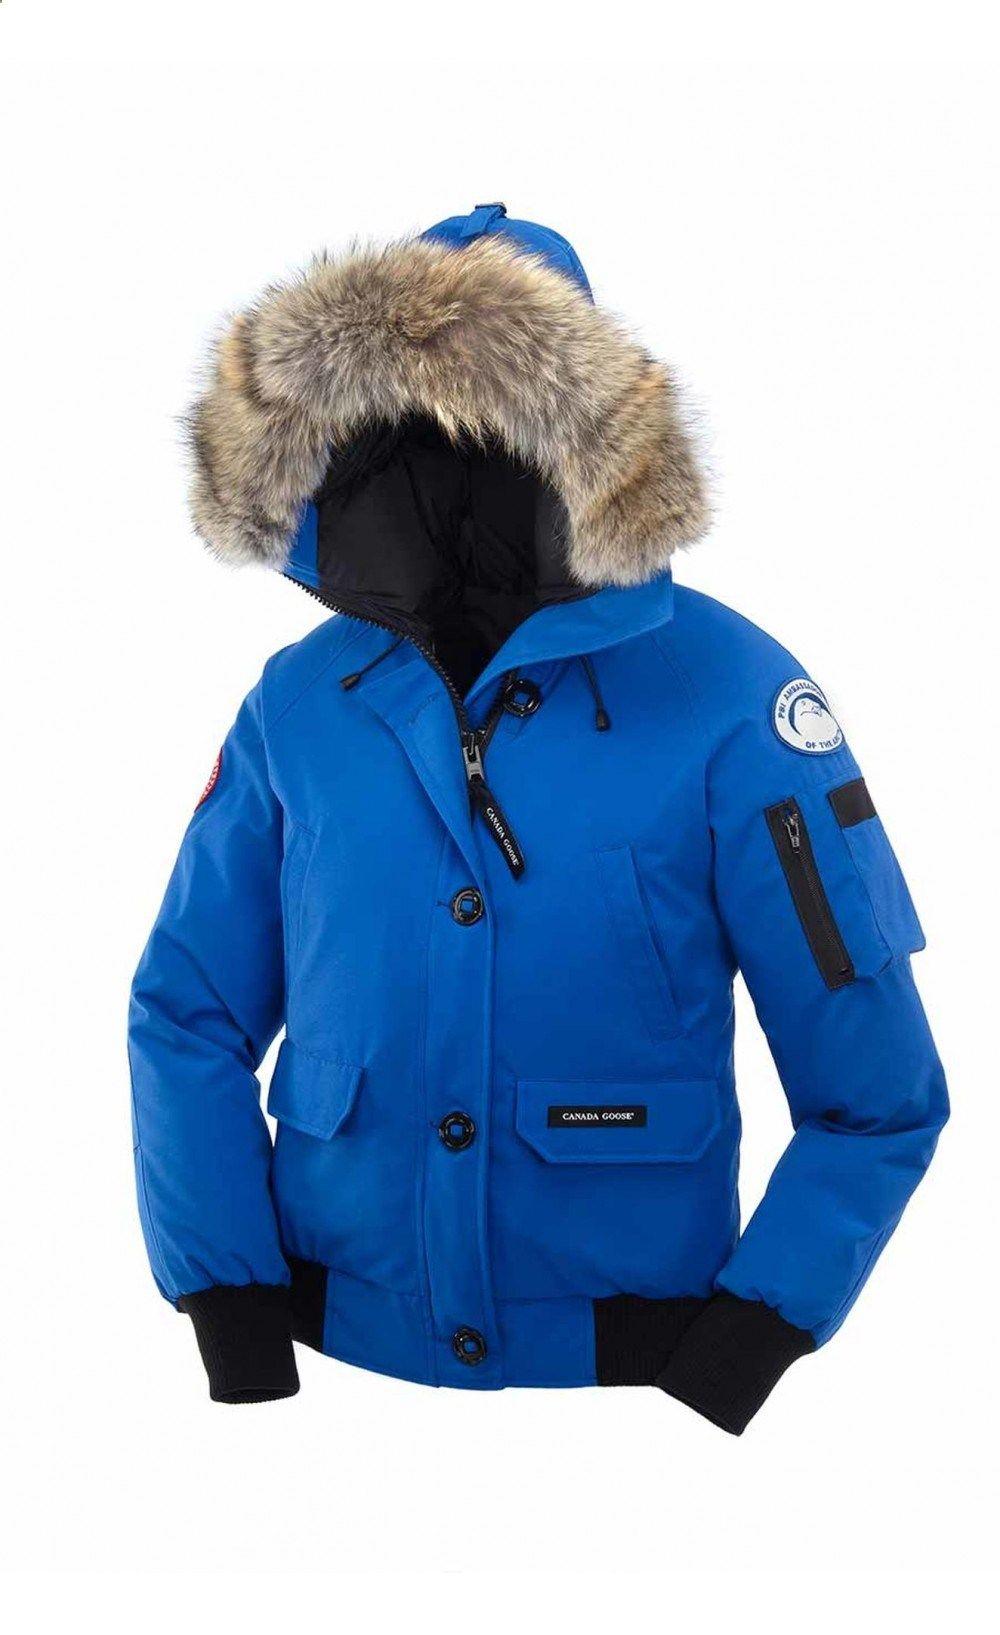 Canada Goose Pbi Expedition Parka Blue Women - Canada Goose #canadagoose # parka #jacket